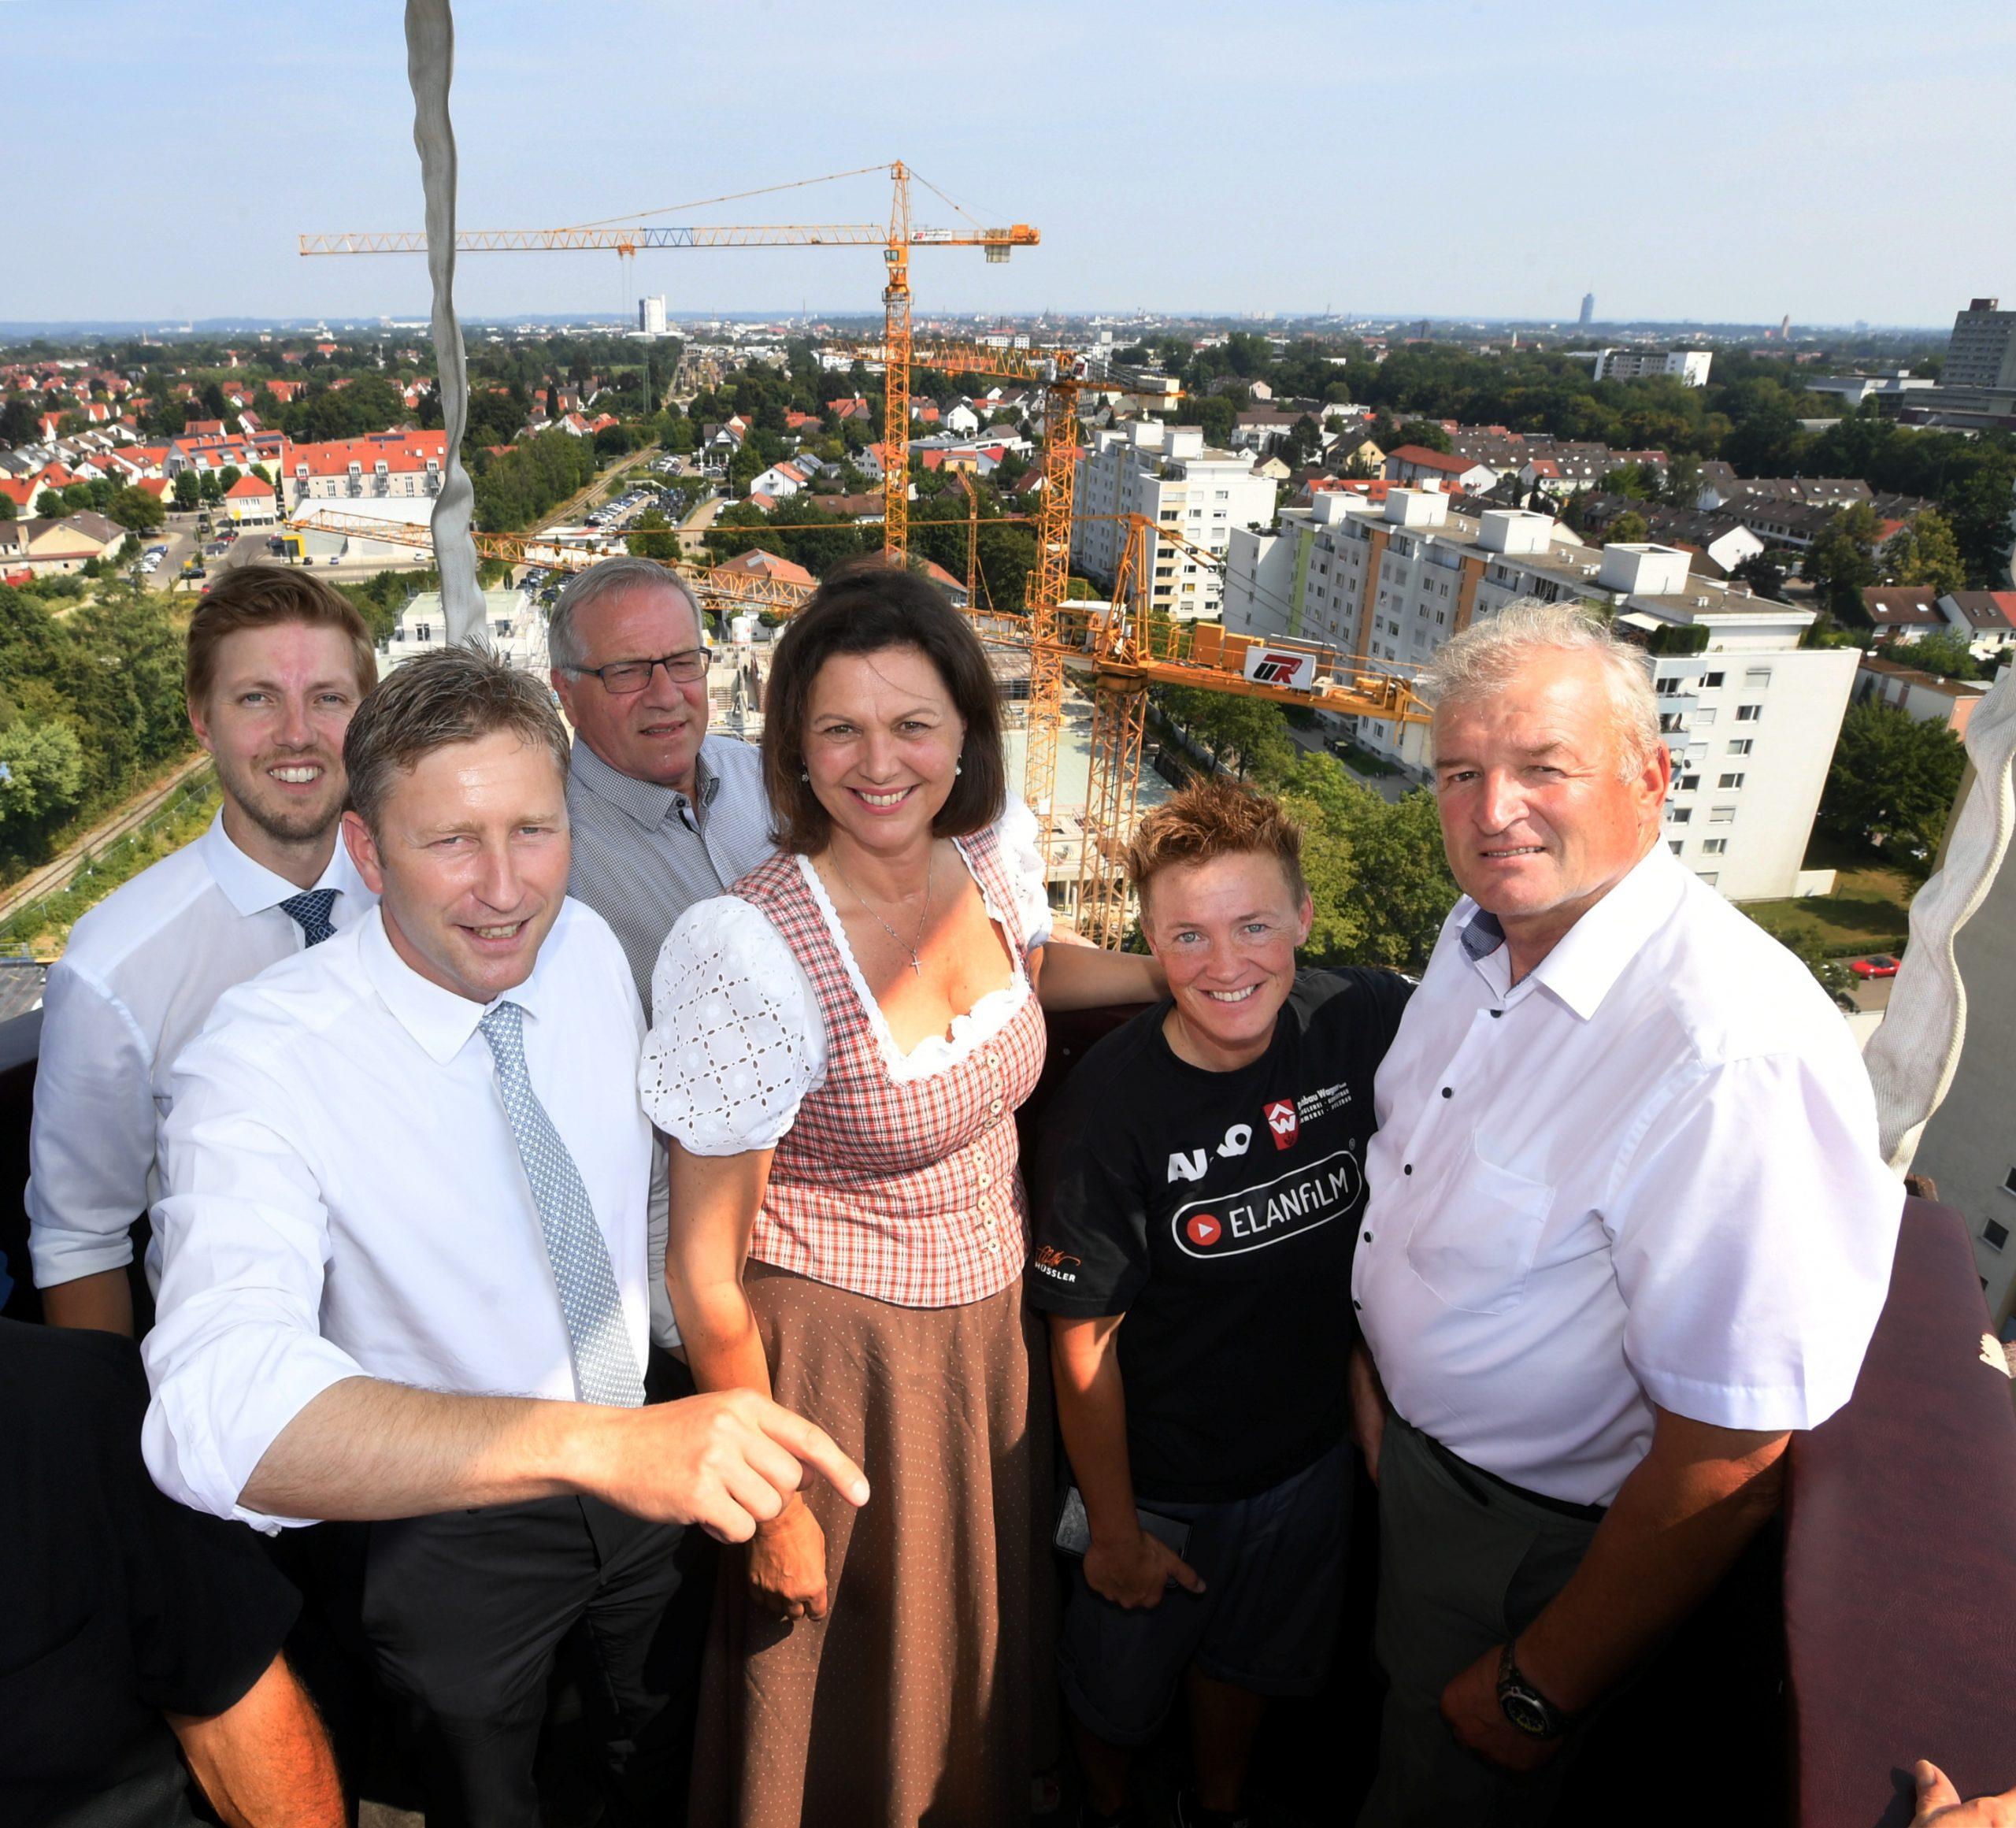 Ilse Aigner besichtigt Sailer Areal in Neusäß / im Bild v.l. Jörg Röhring, Richard Greiner, Johannes Hintersberger, Ilse Aigner, Tina Schüssler und Wilhelm Kugelmann